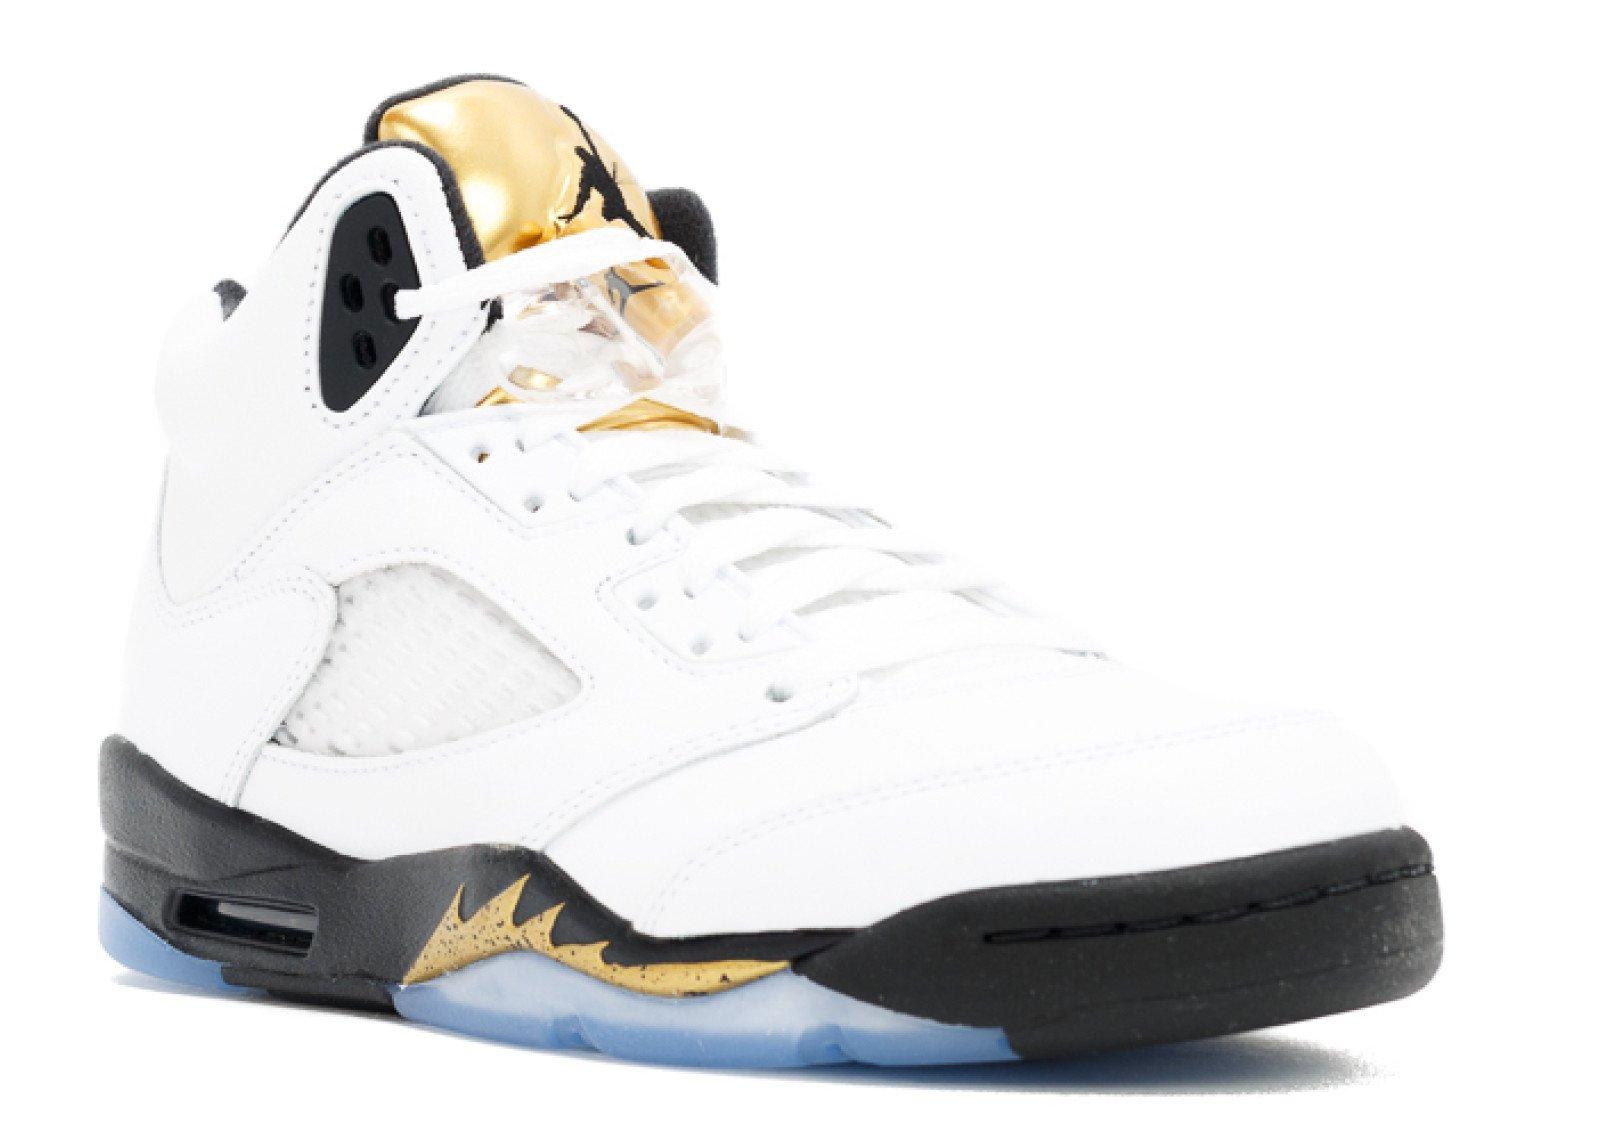 Galleon - NIKE Boys Air Jordan 5 Retro BG Olympic Gold White Black-Gold  Leather Size 5.5Y 487b073613